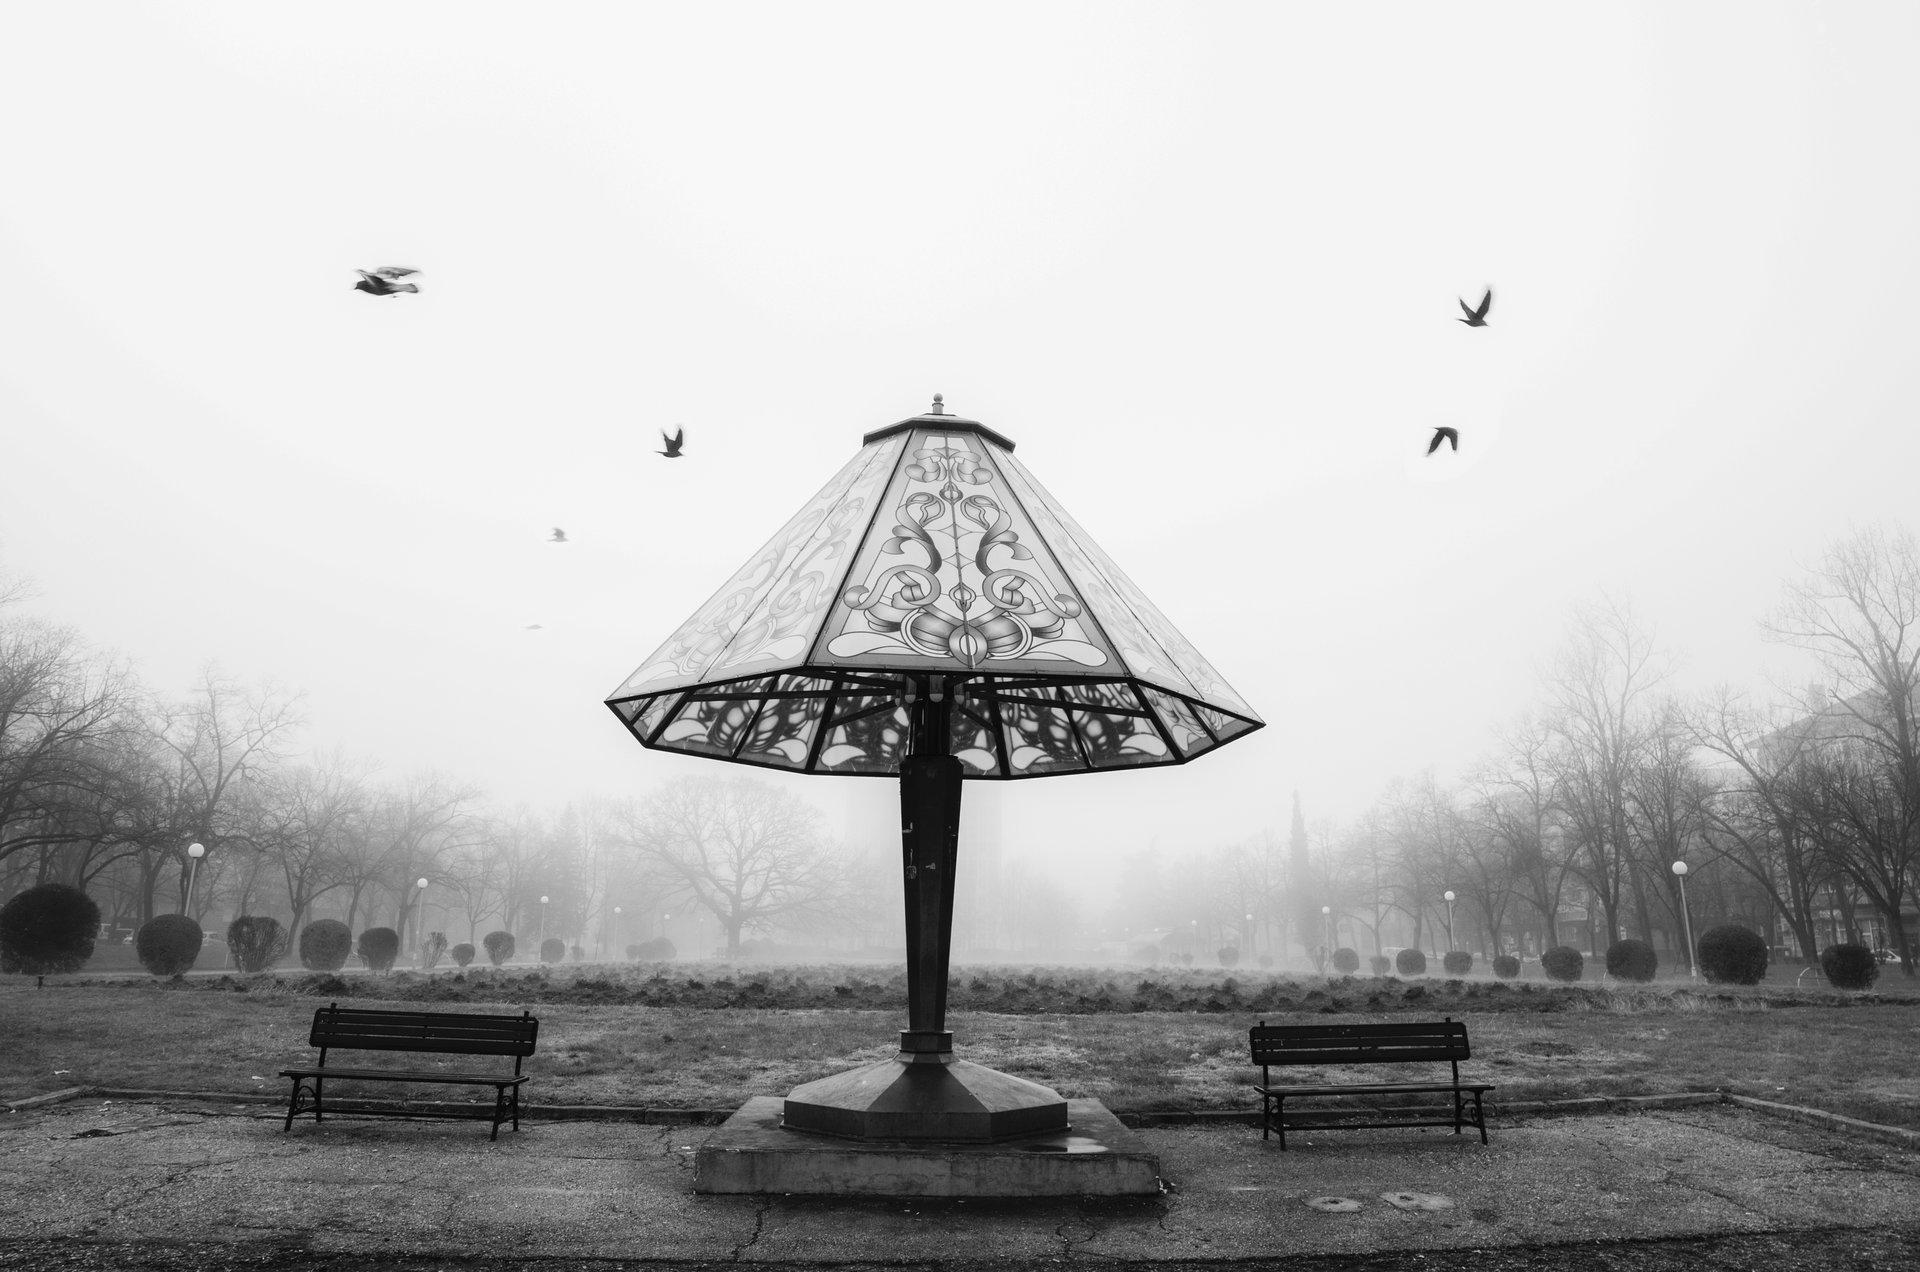 Photo in Everything else   Author Nikolaj Dobrev - N.Dobrev   PHOTO FORUM